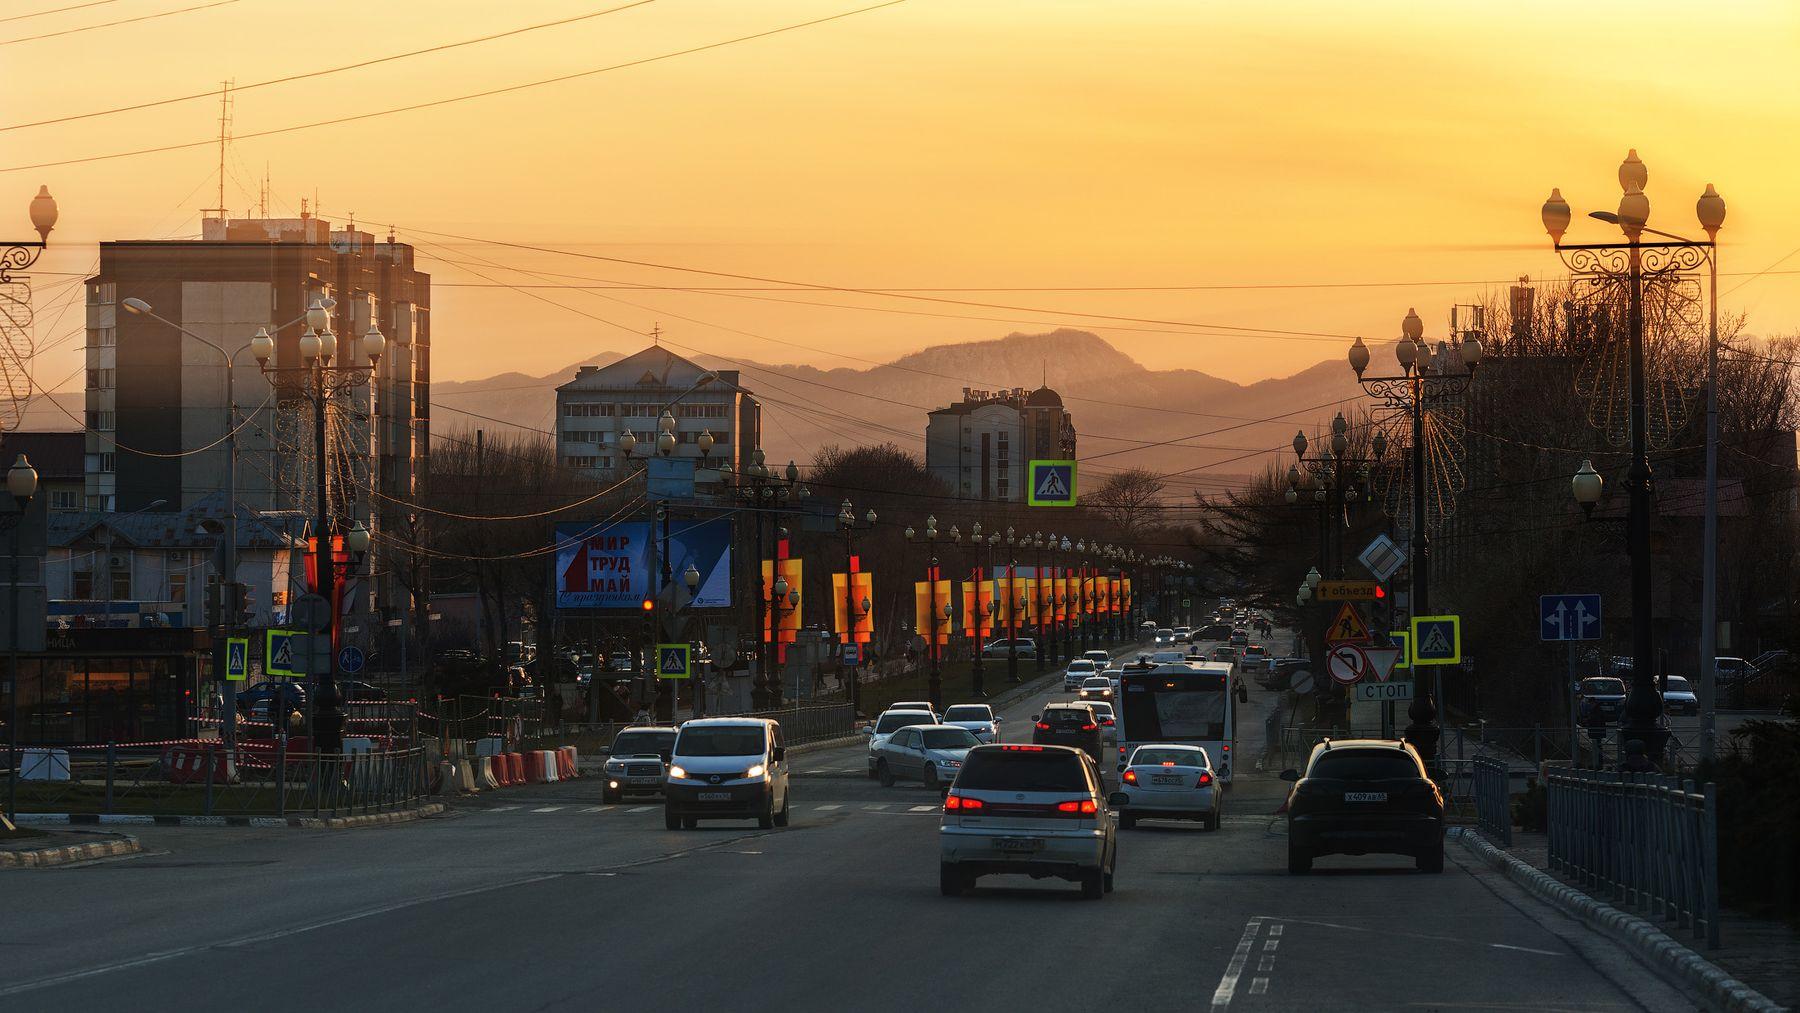 На закате... Южно-Сахалинск проспект Победы вечер